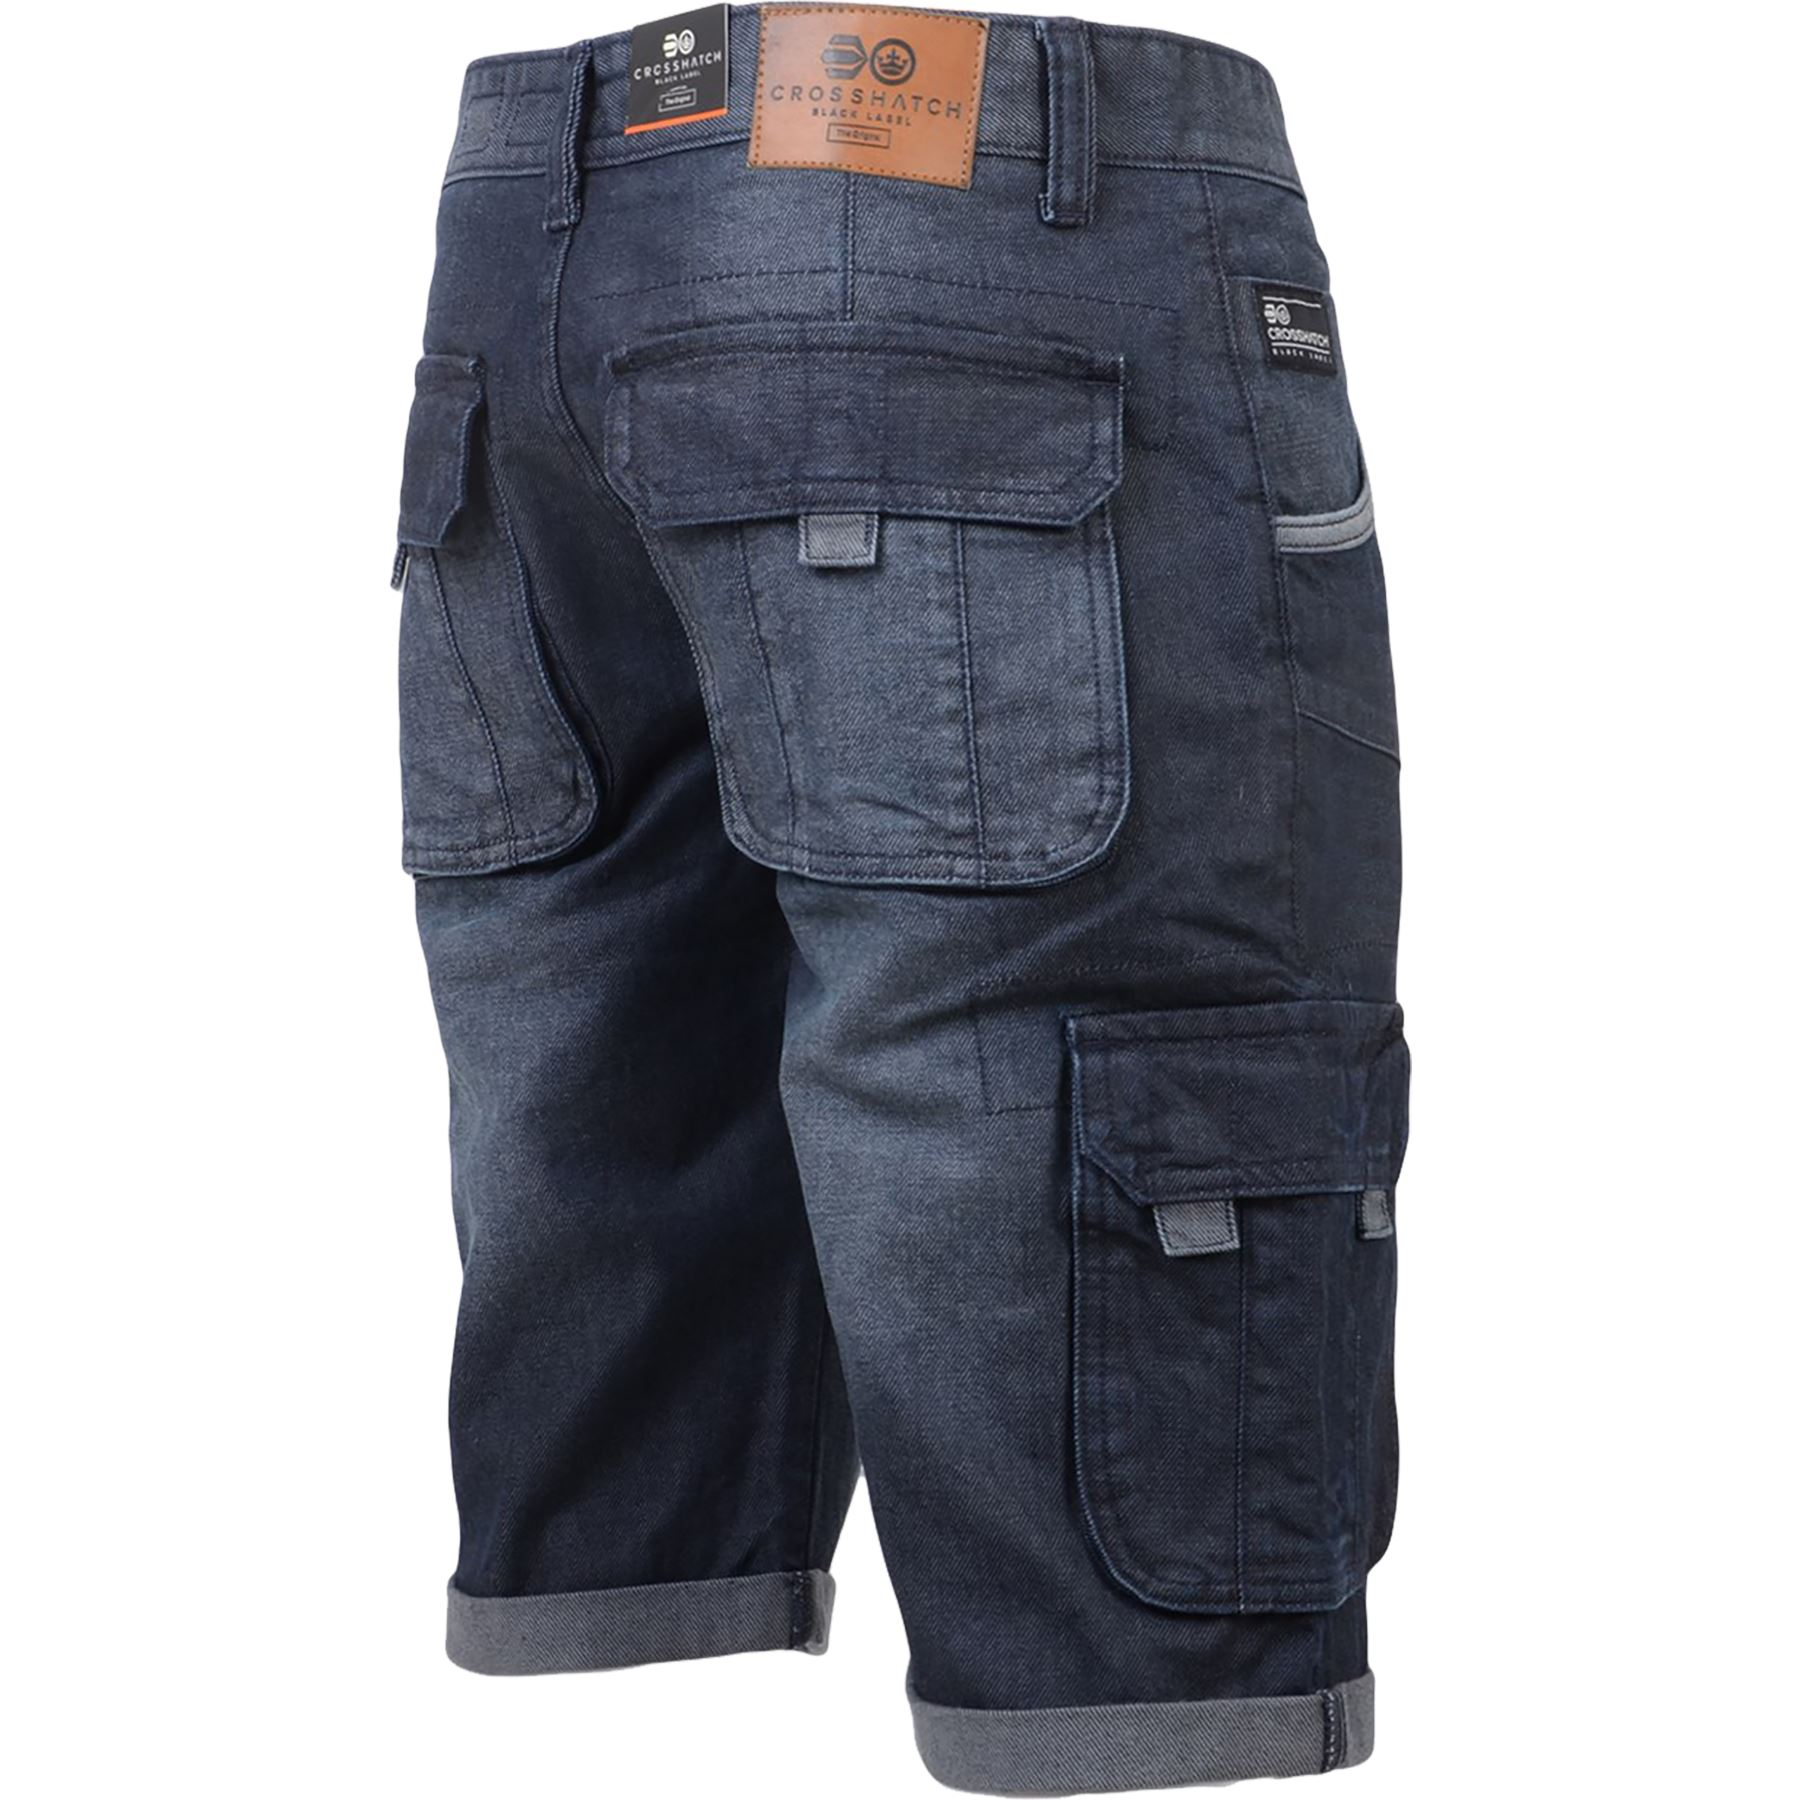 New-Mens-Crosshatch-Canvas-Cargo-Denim-Camo-Shorts-Chino-2019-Styles-30-42-034 thumbnail 10